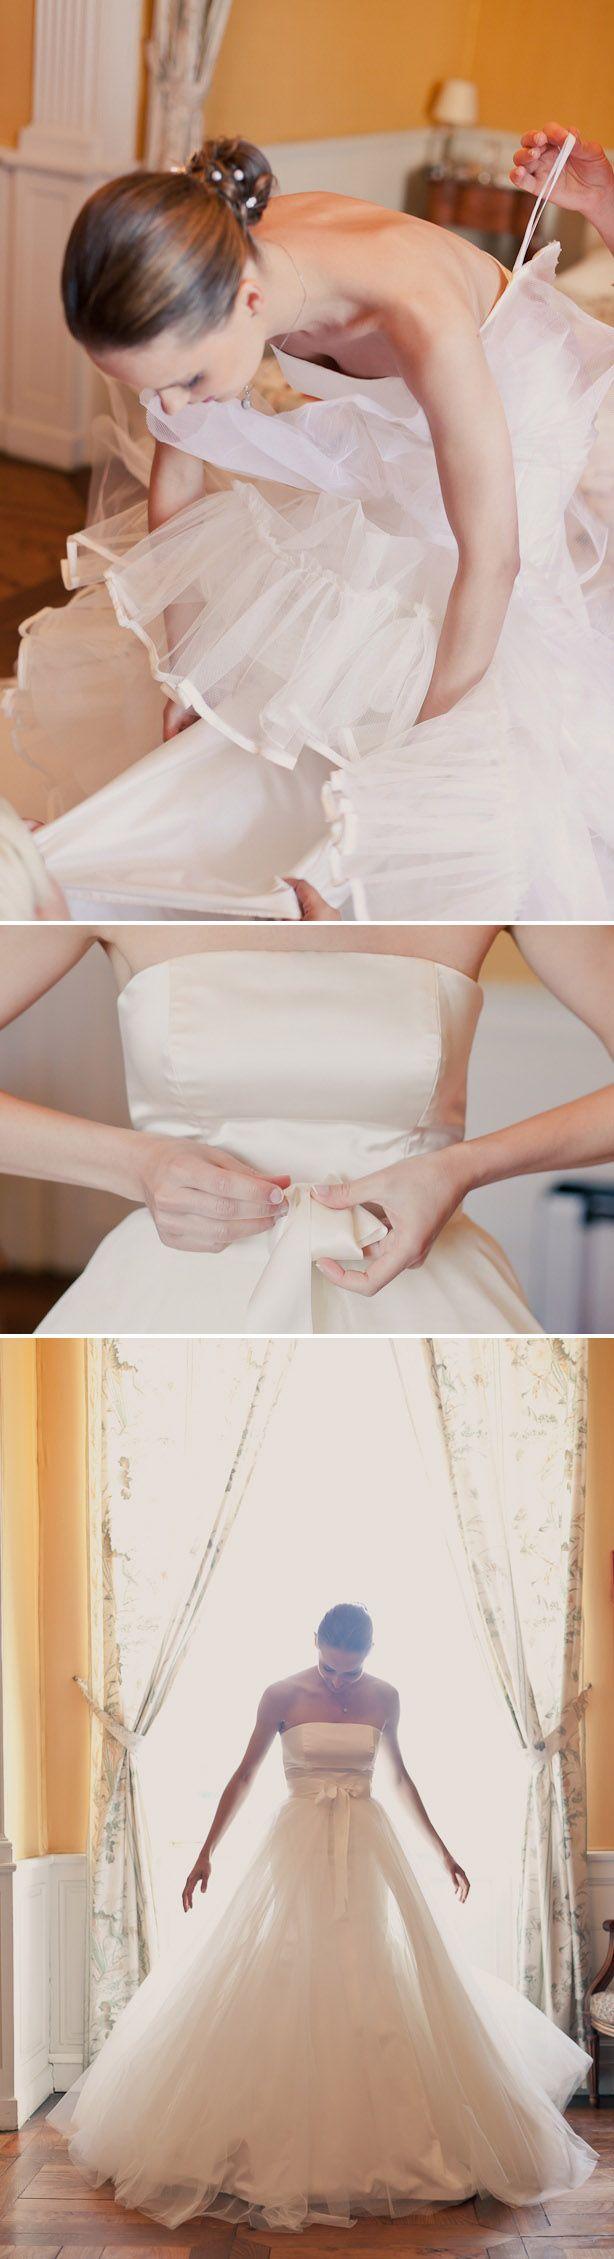 tutu-inspired-wedding-dress-monique-lhuillier